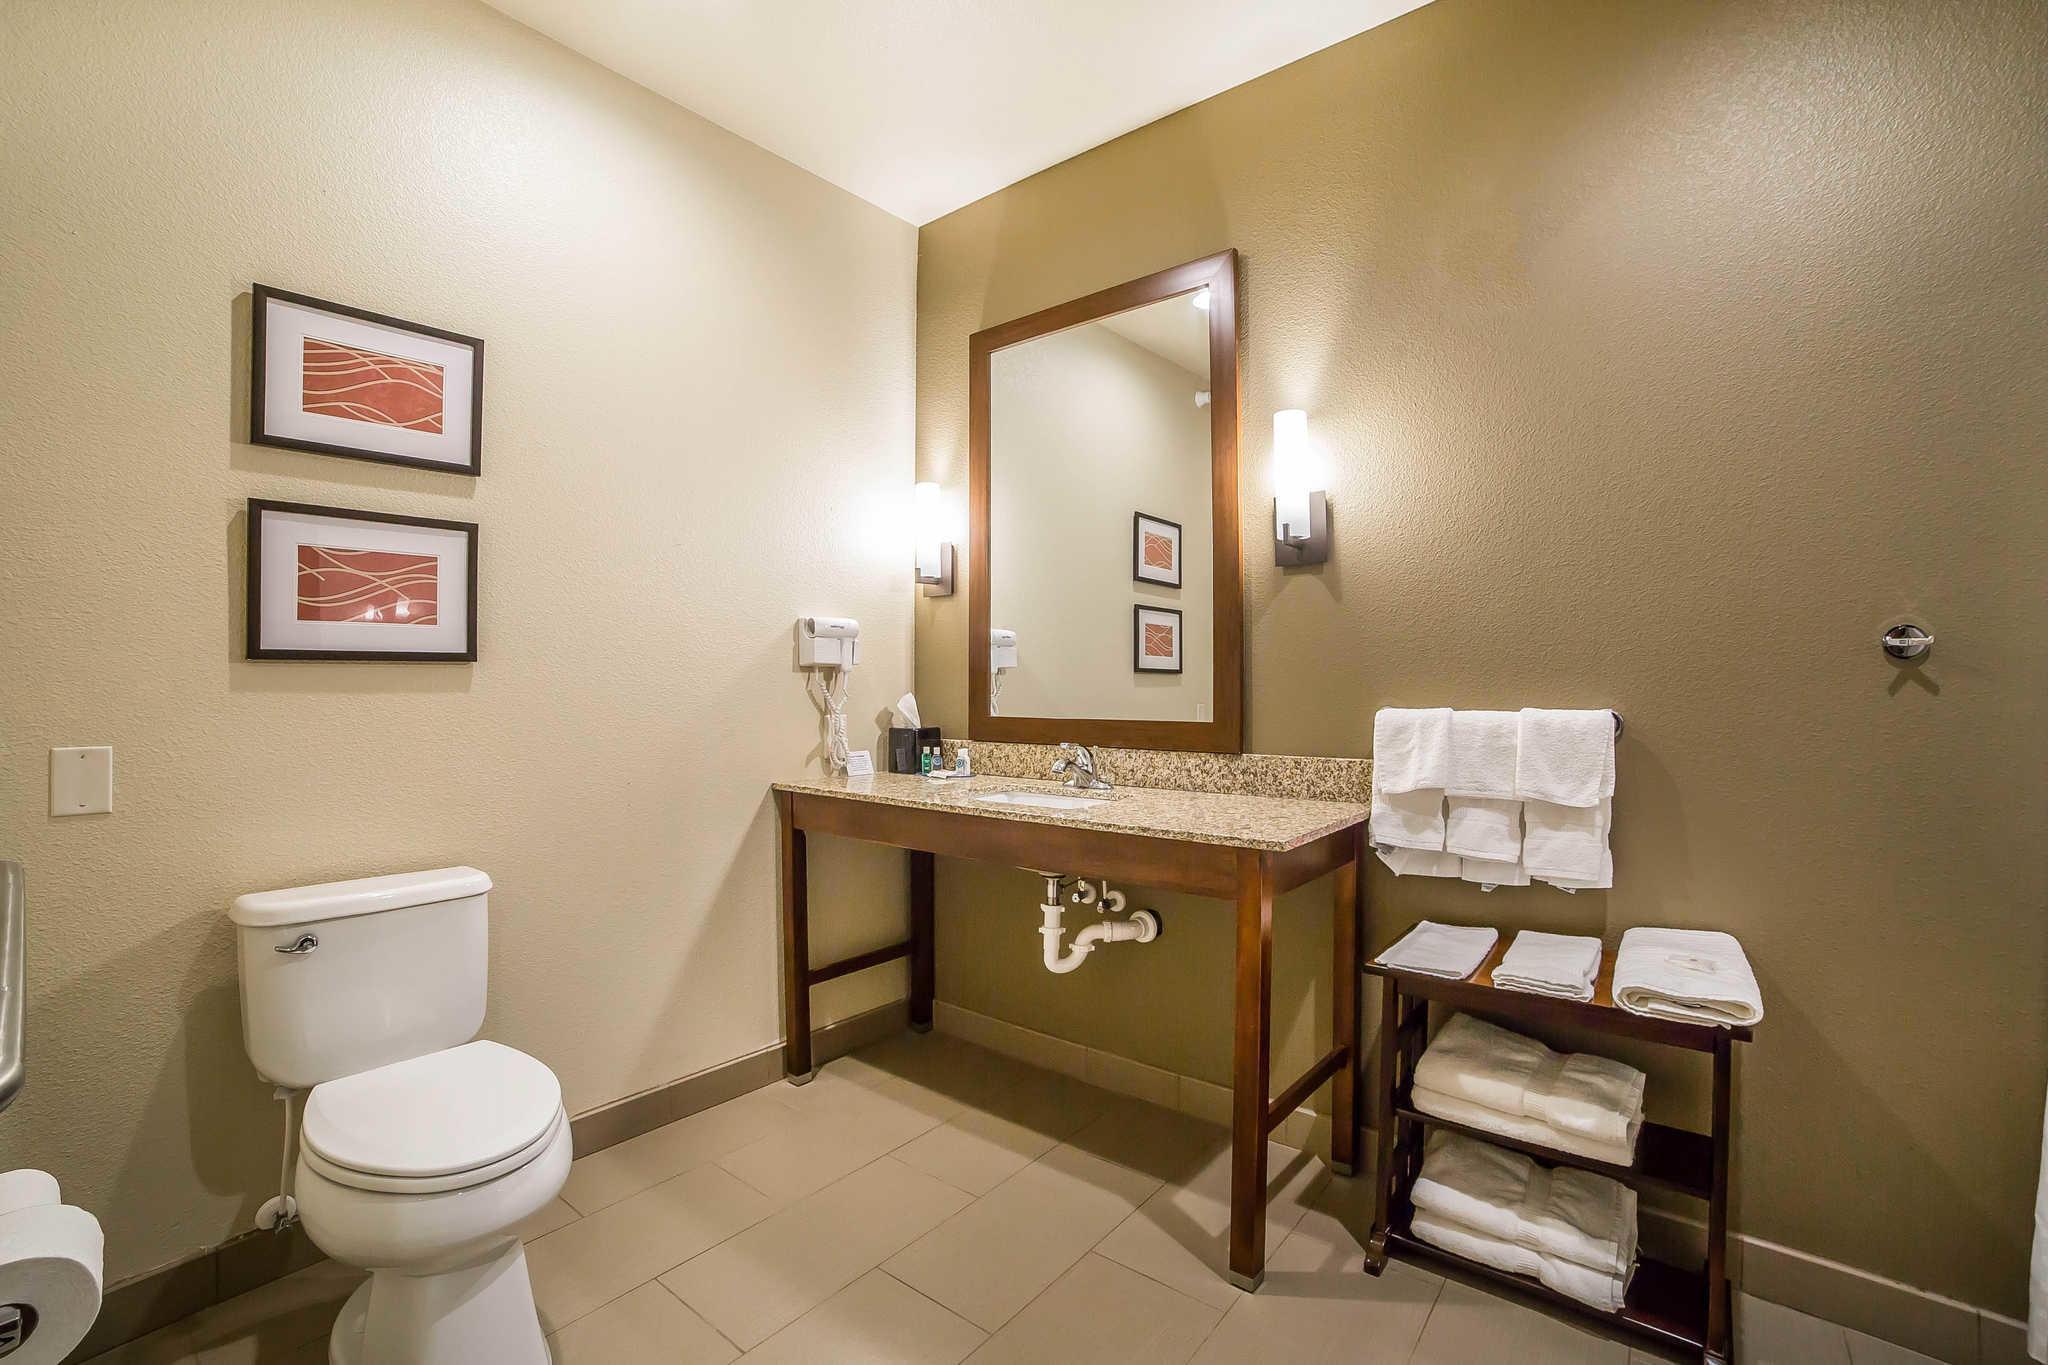 Comfort Inn & Suites Near Mt. Rushmore image 15